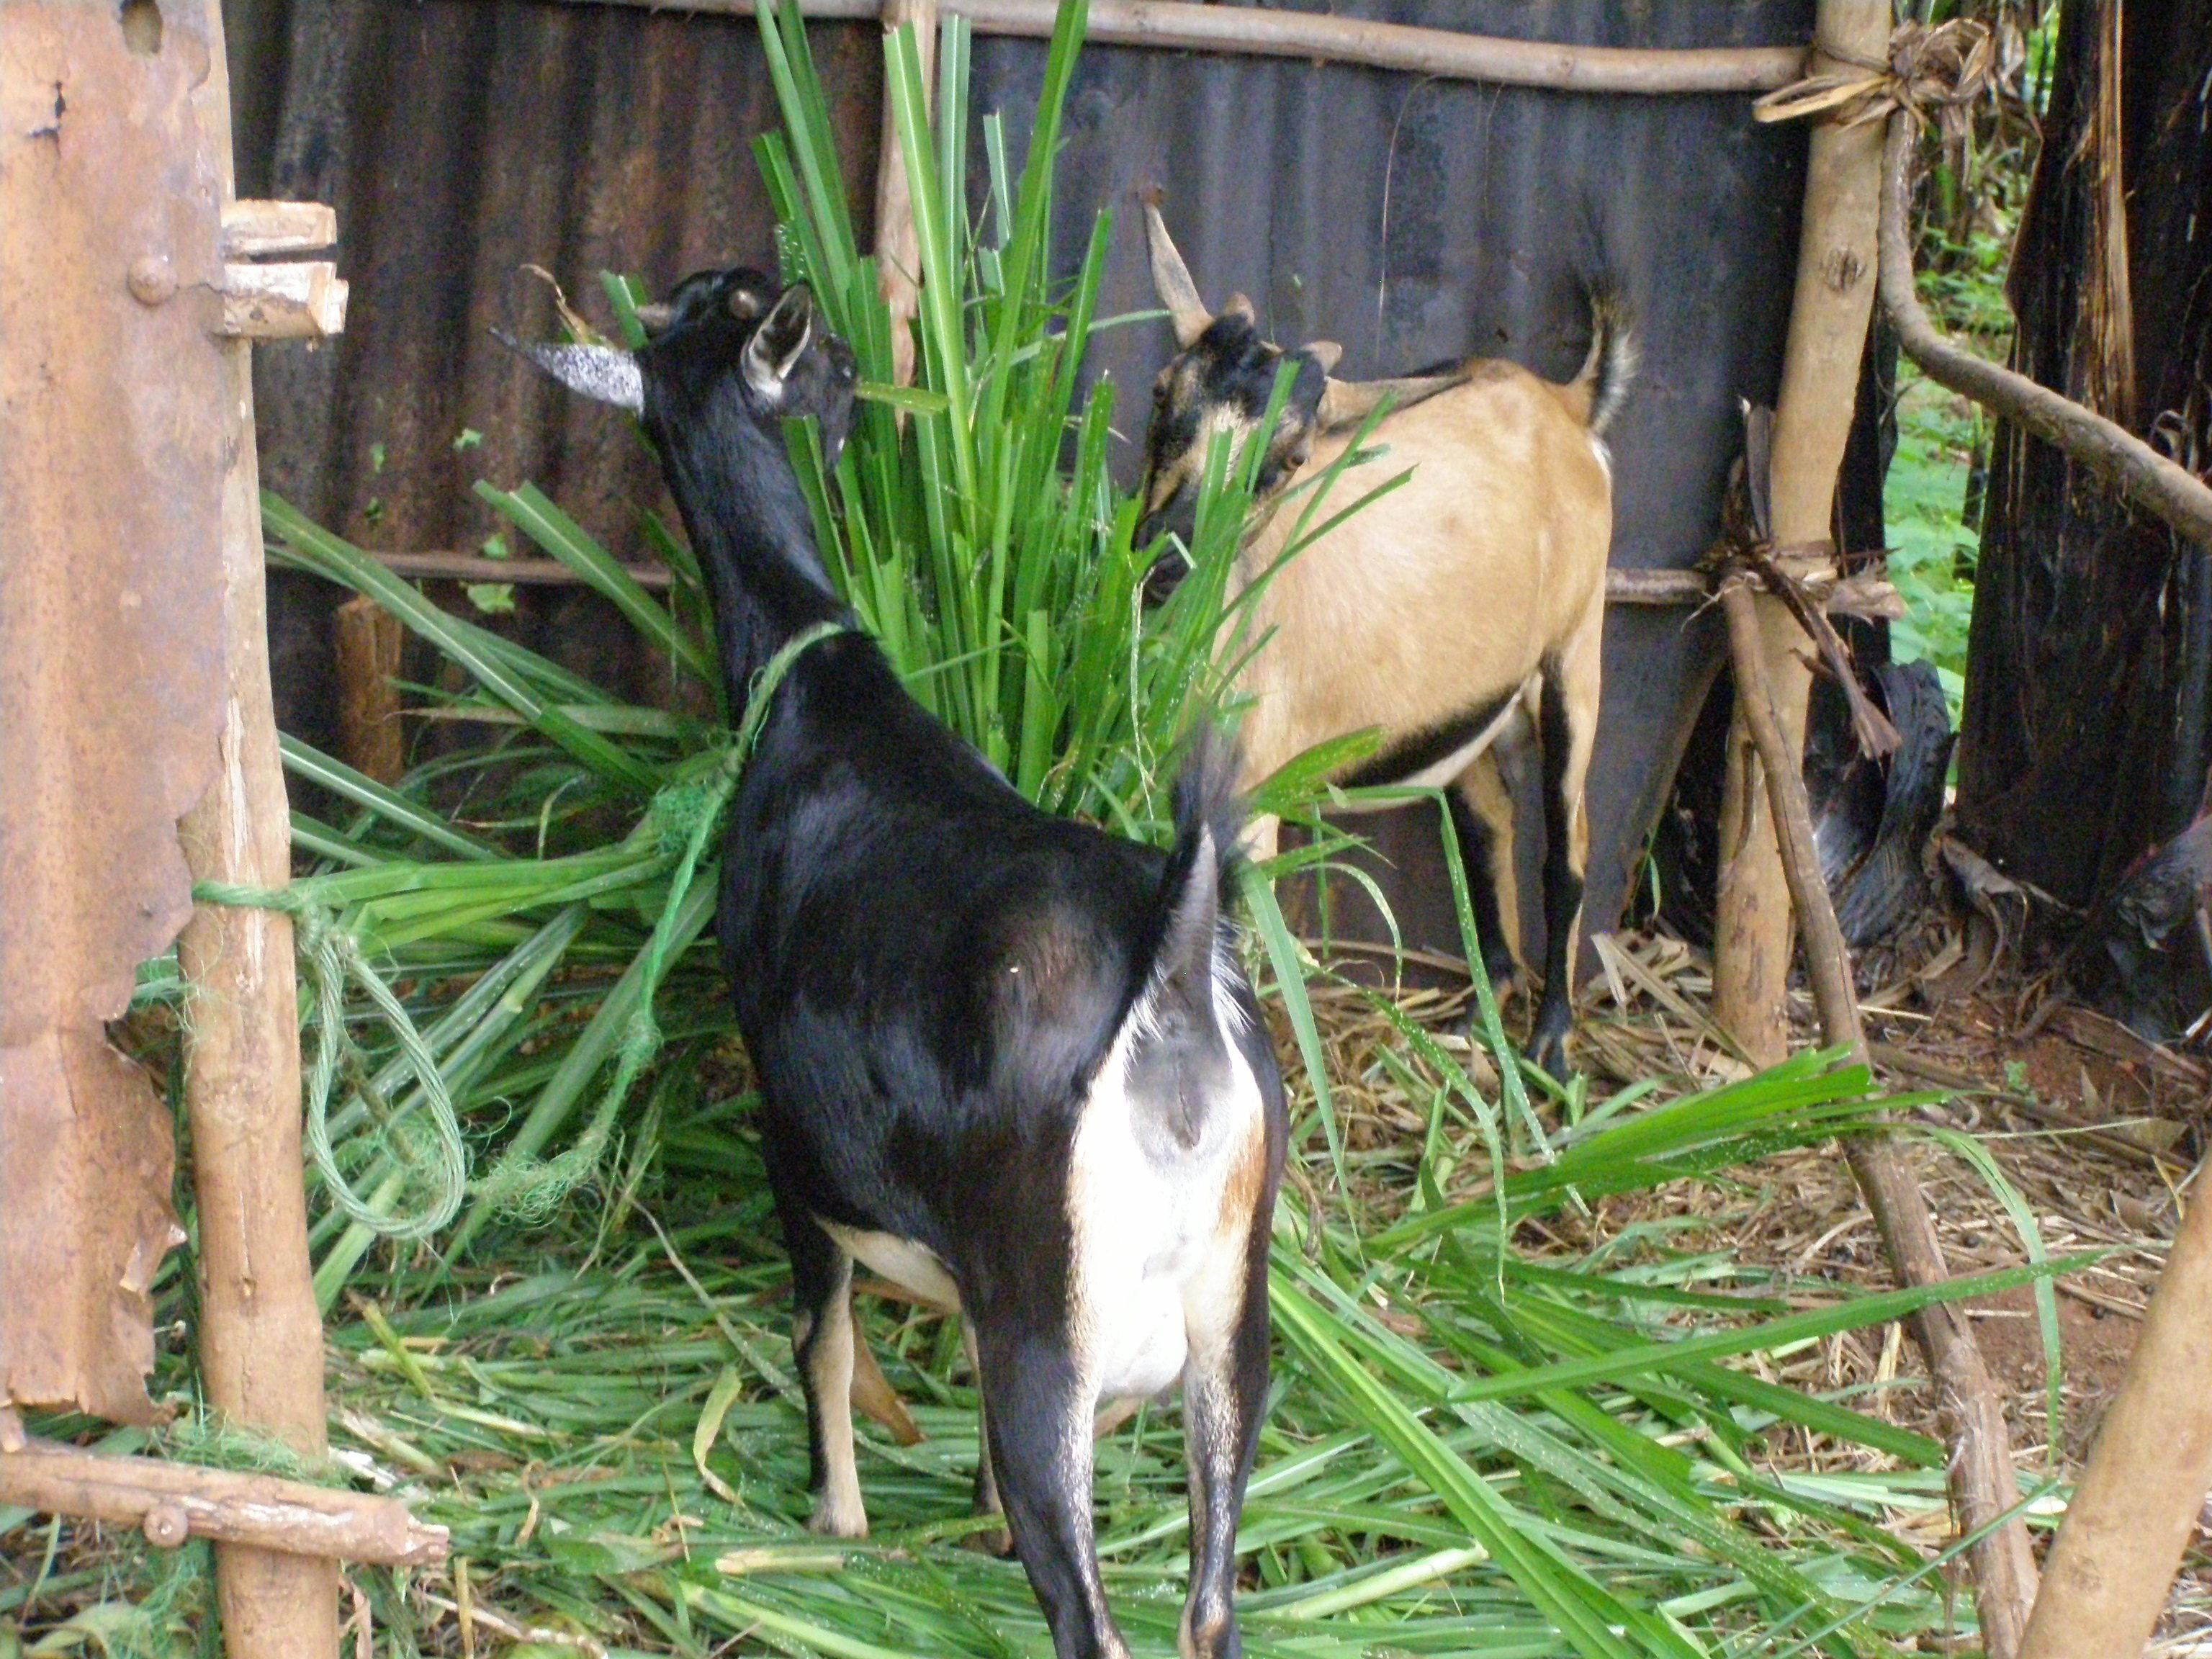 File:Rwandan farm cooperative goats.jpg - Wikimedia Commons